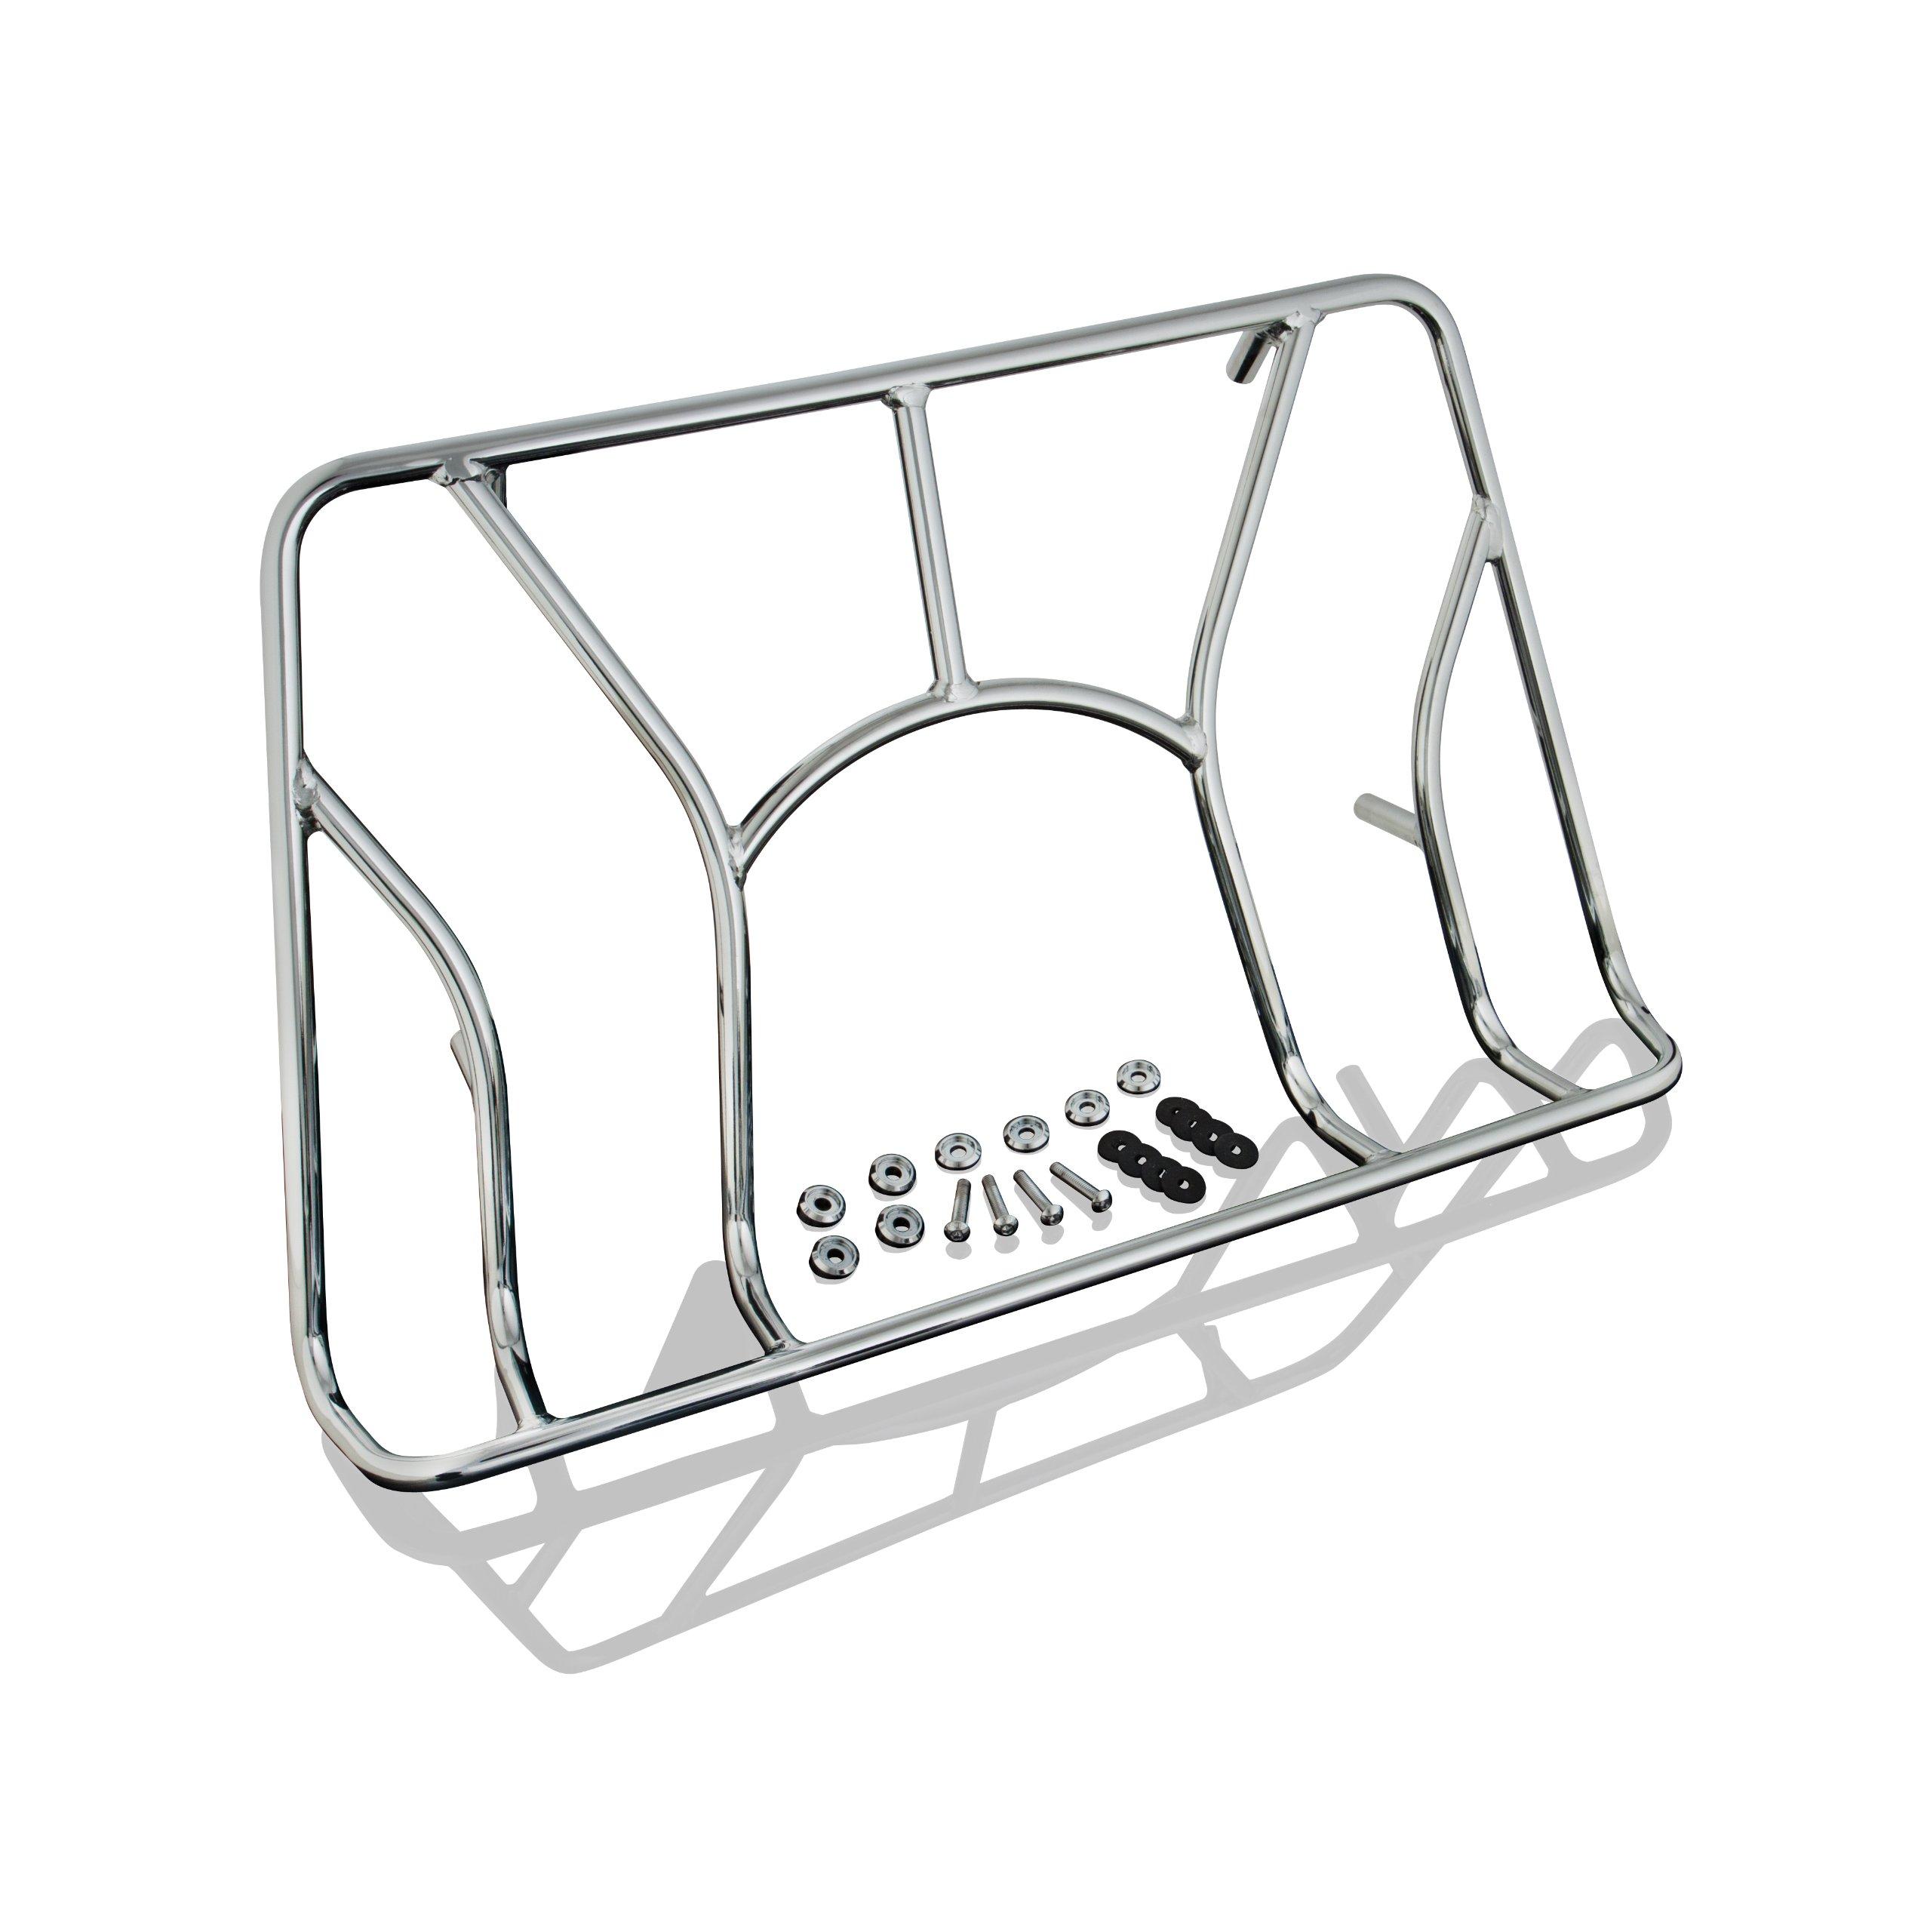 Show Chrome Accessories 41-155 Tour Trunk Rack